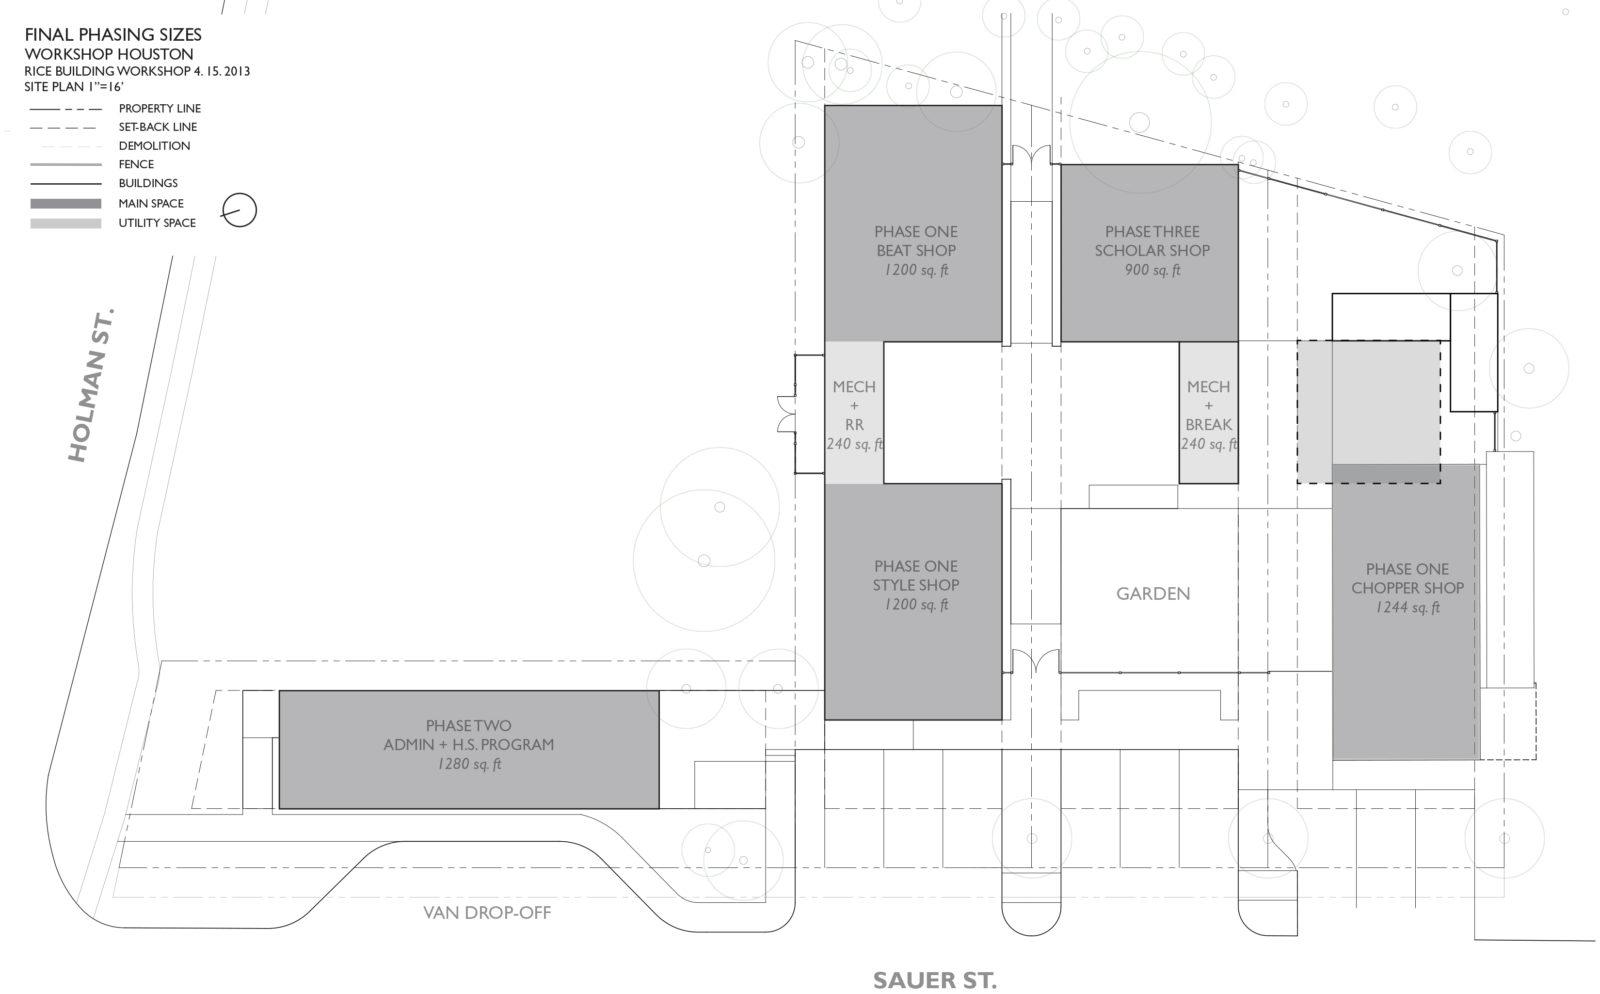 Workshop Houston Plan Diagram 2